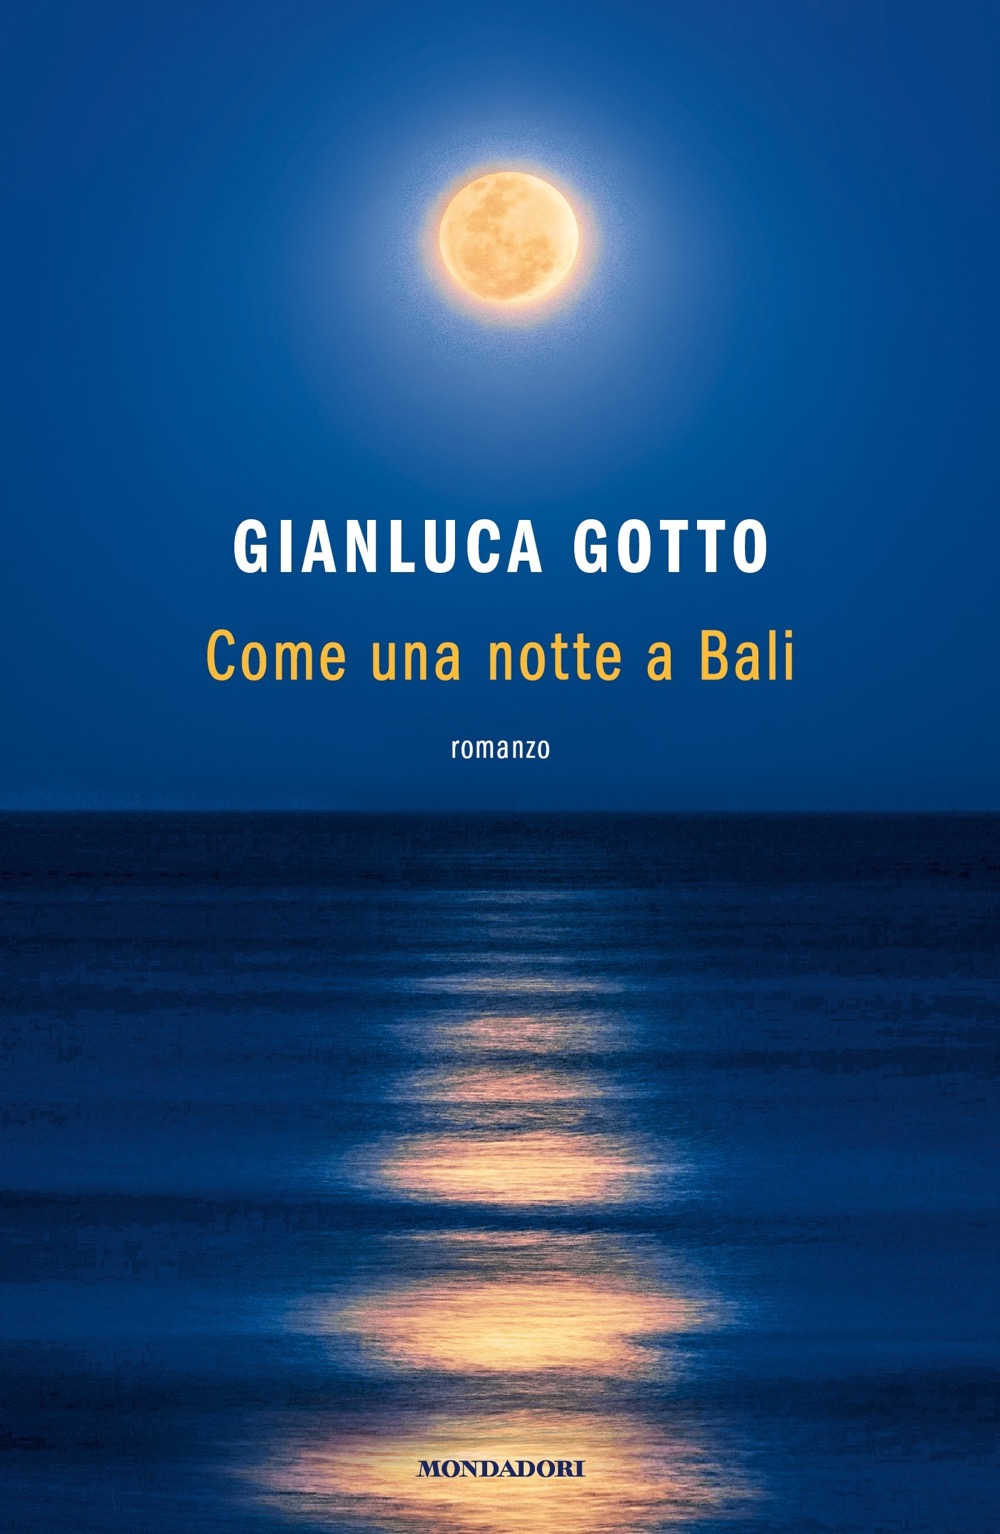 Gianluca Gotto